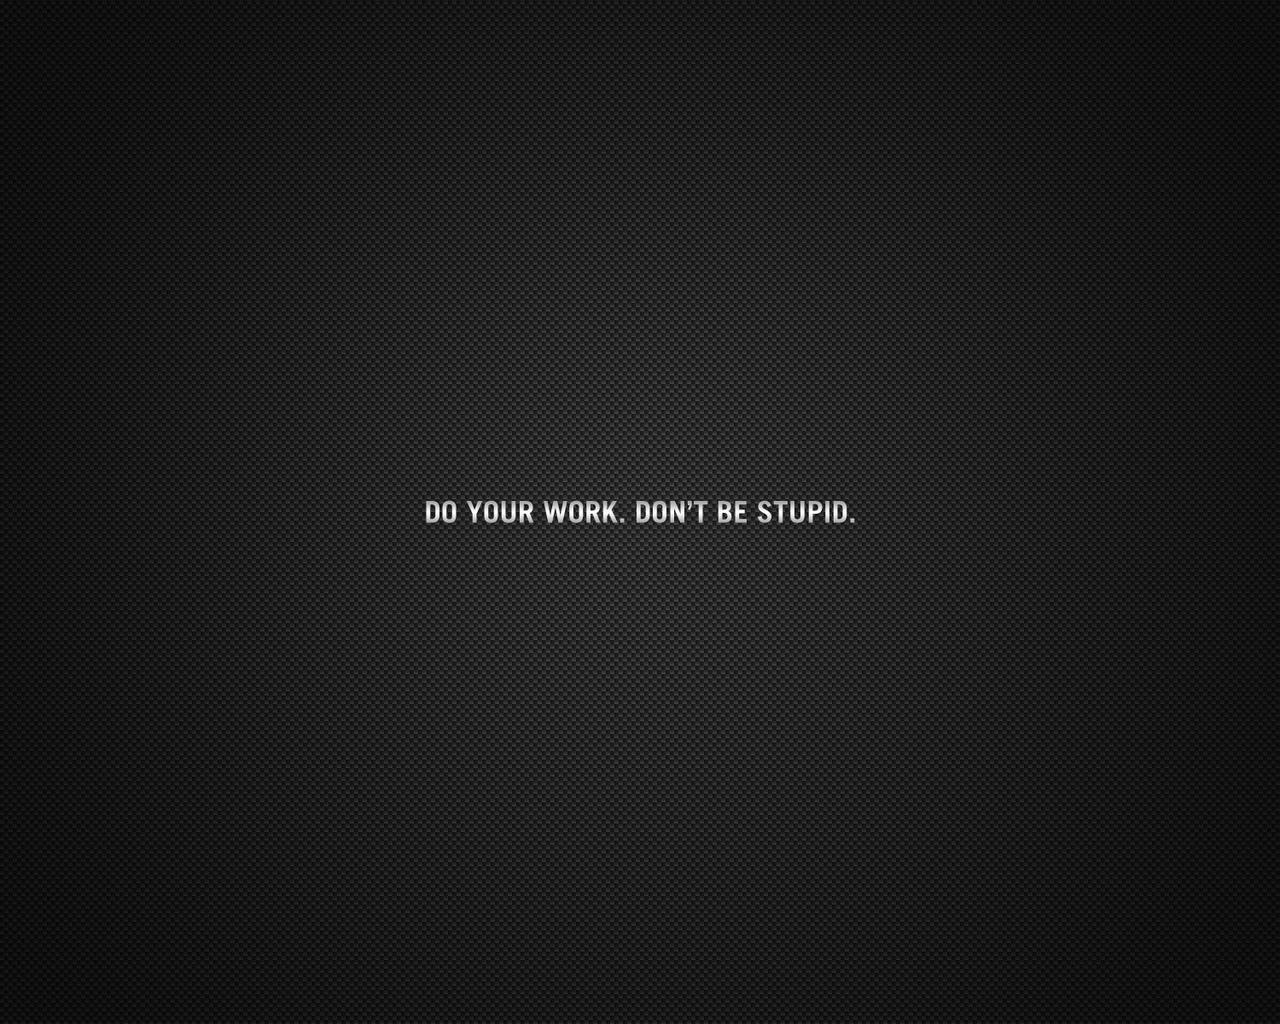 advice wallpaper 1280x1024